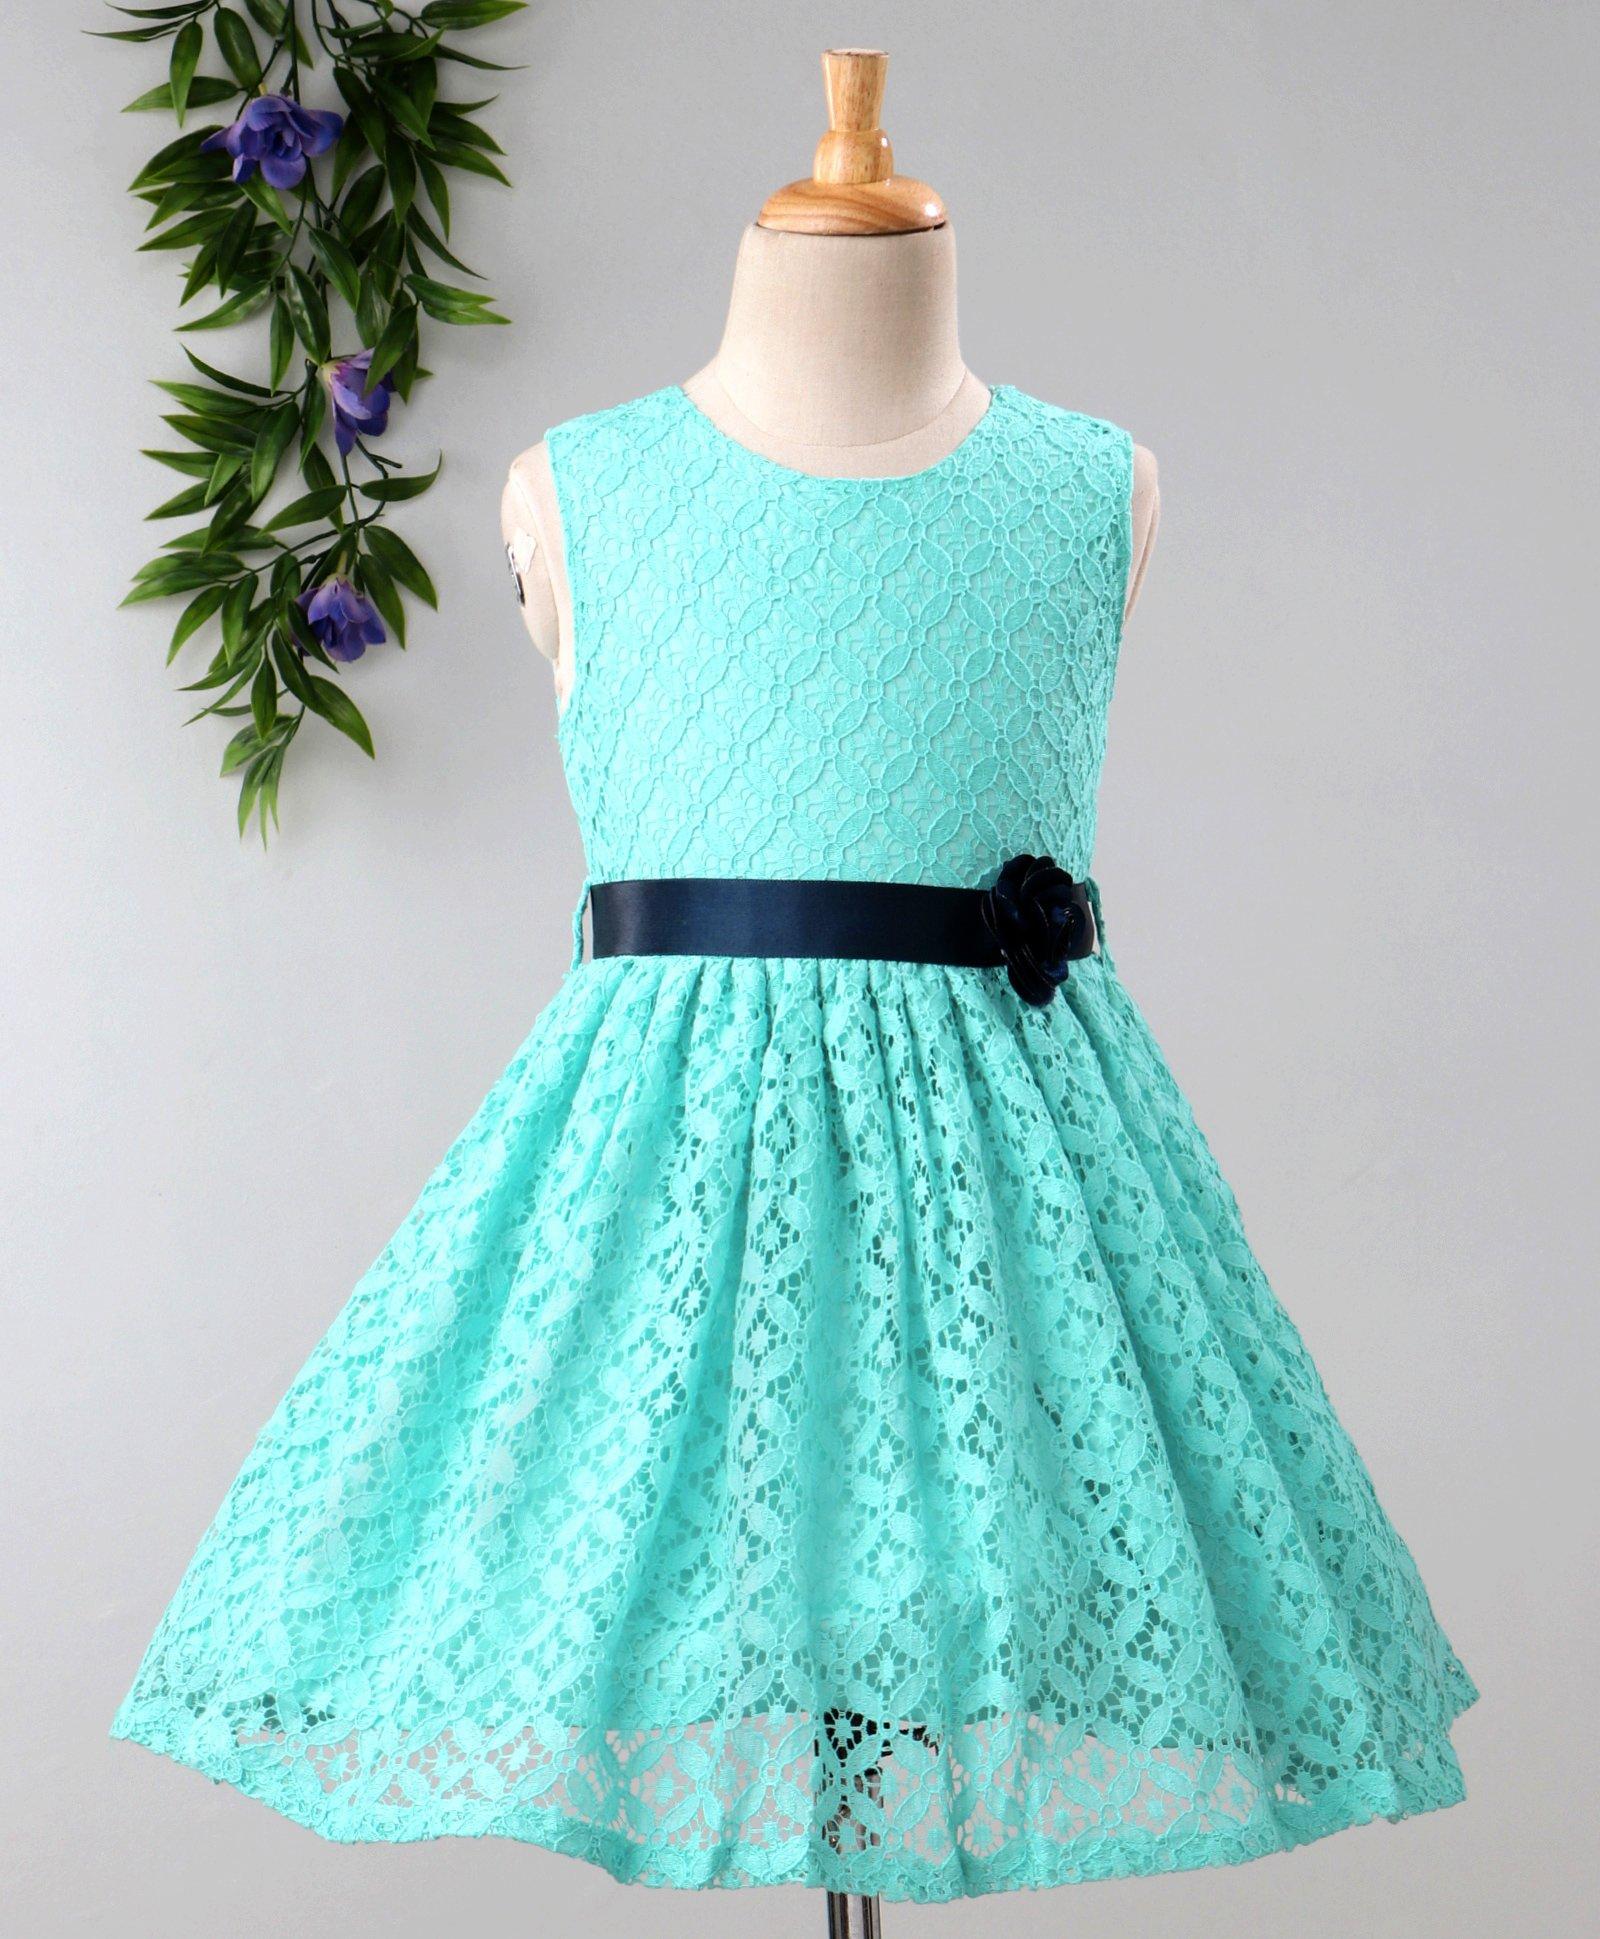 0b41835bbda Babyhug Sleeveless Pleated Net Party Wear Frock With Flower Motif - Sky Blue